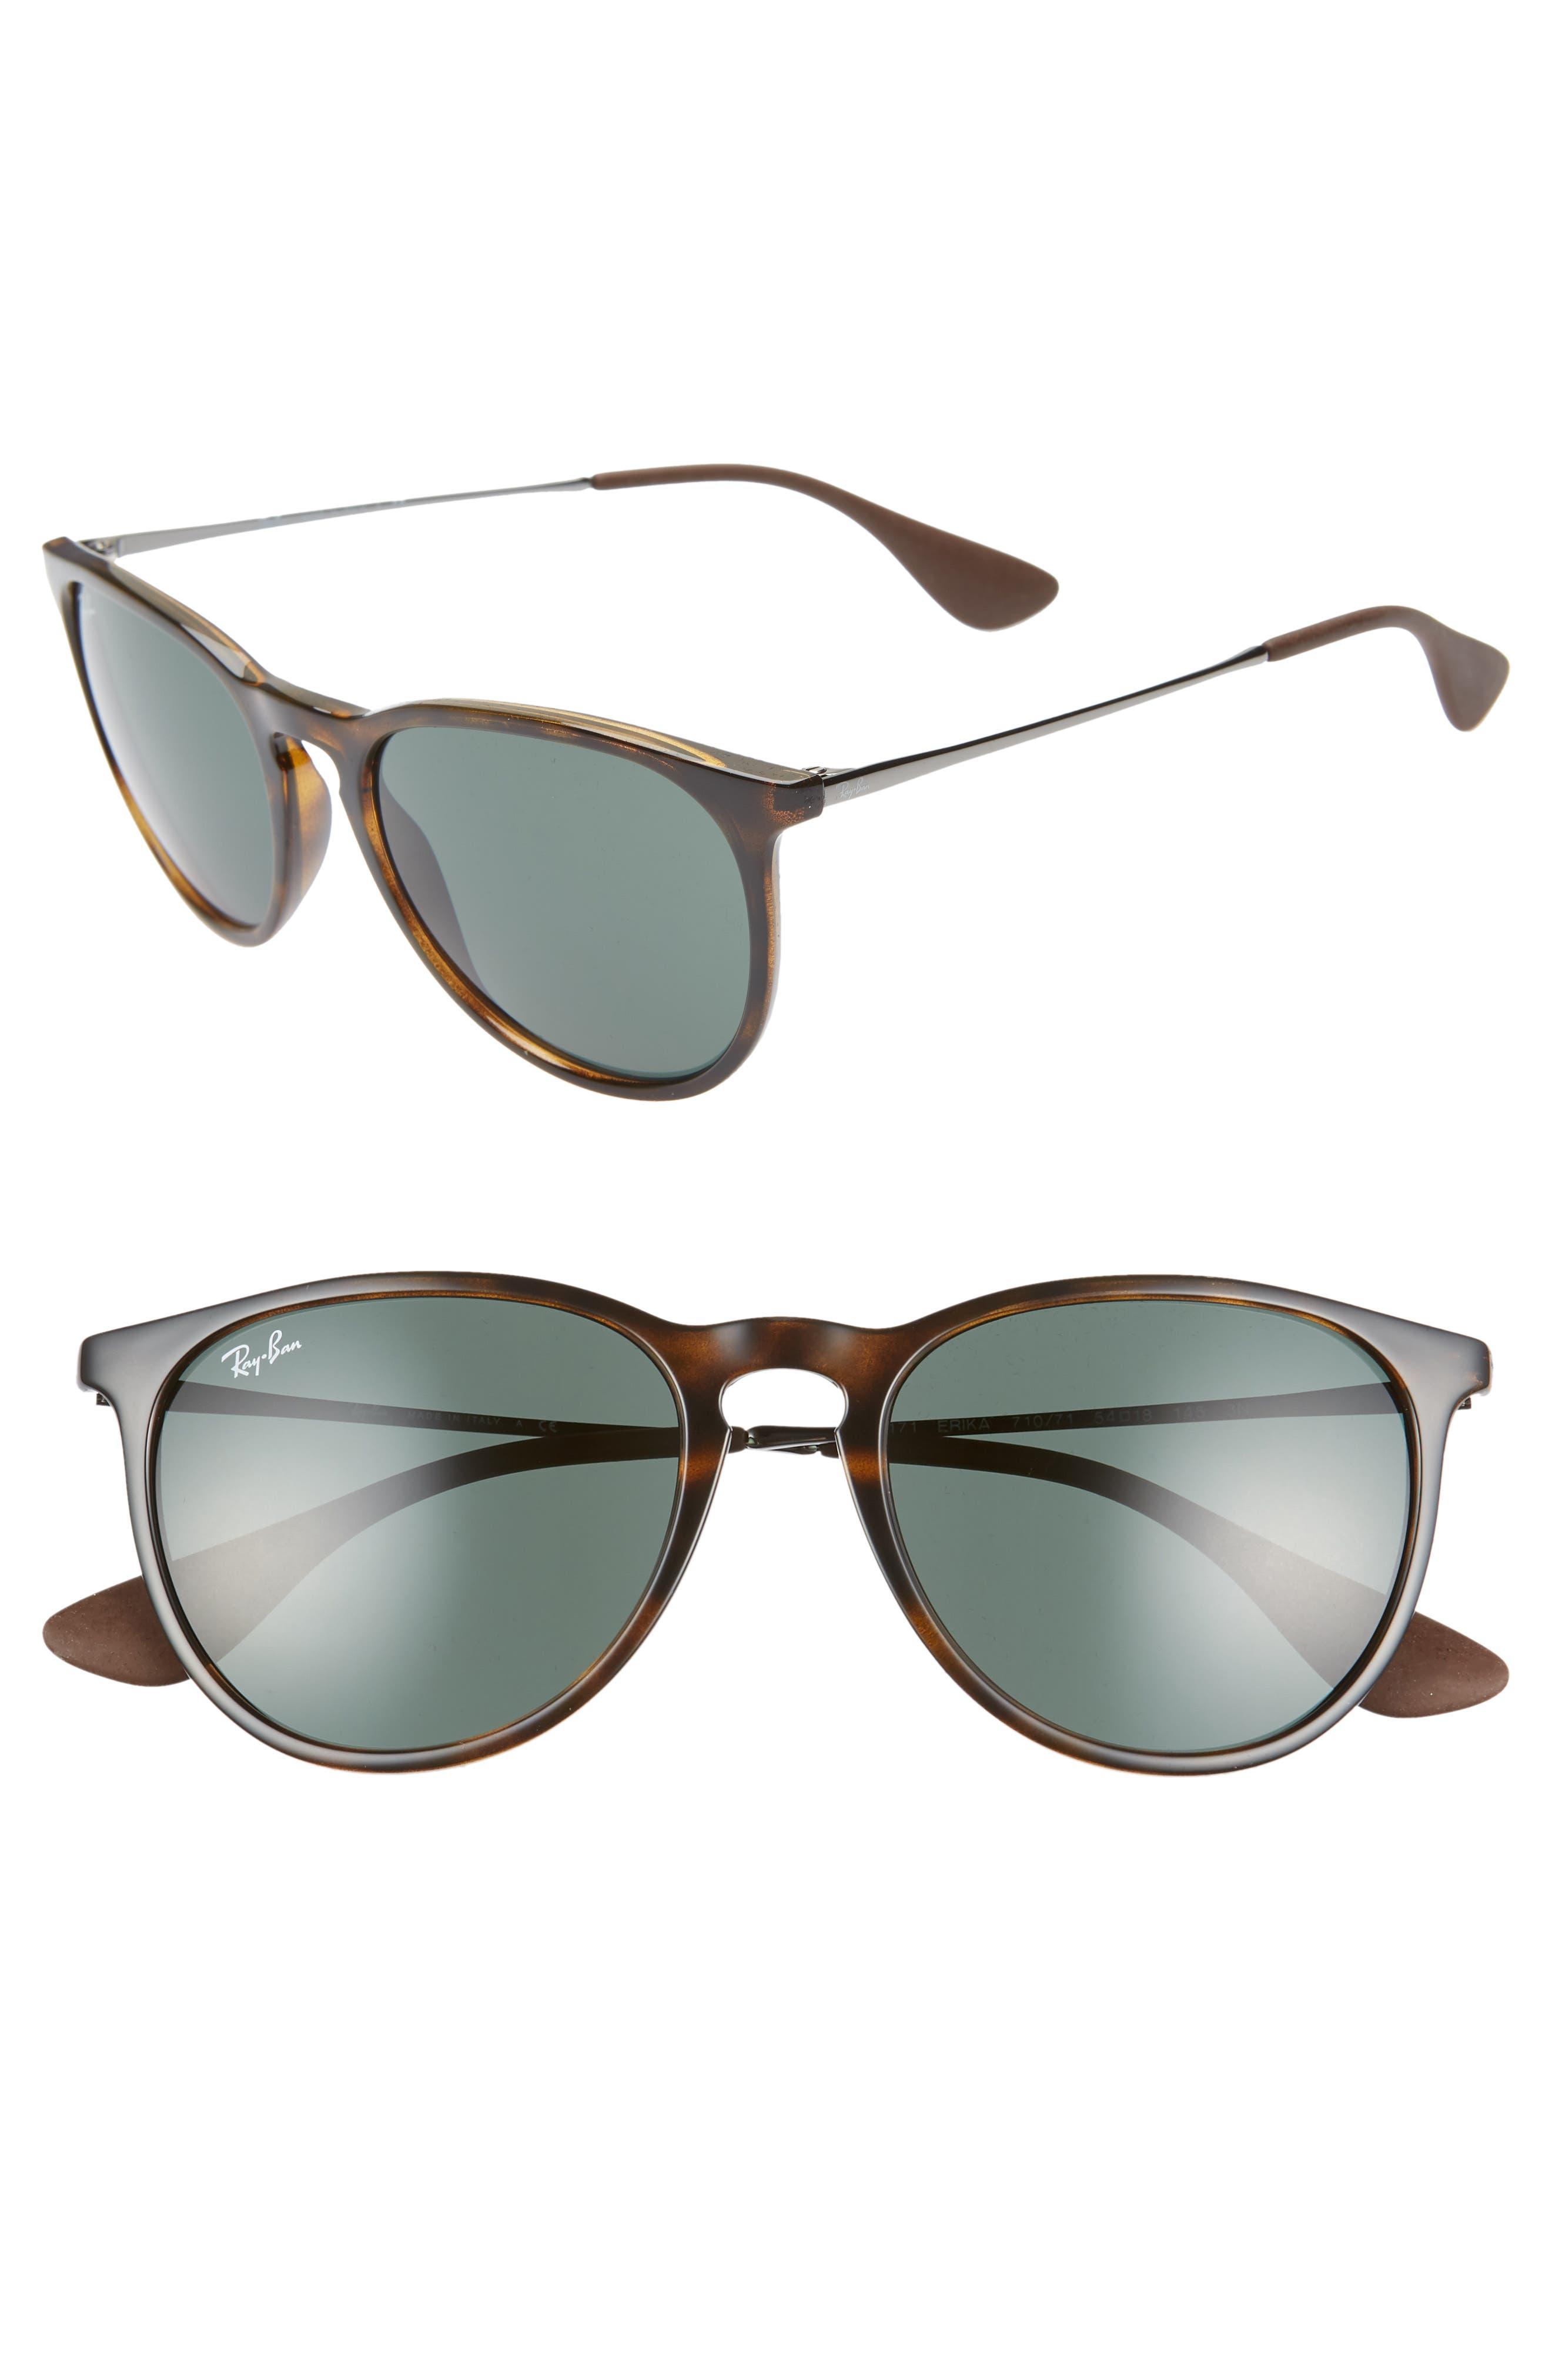 Ray-Ban Erika Classic 5m Sunglasses - Lite Havana/ Green Solid